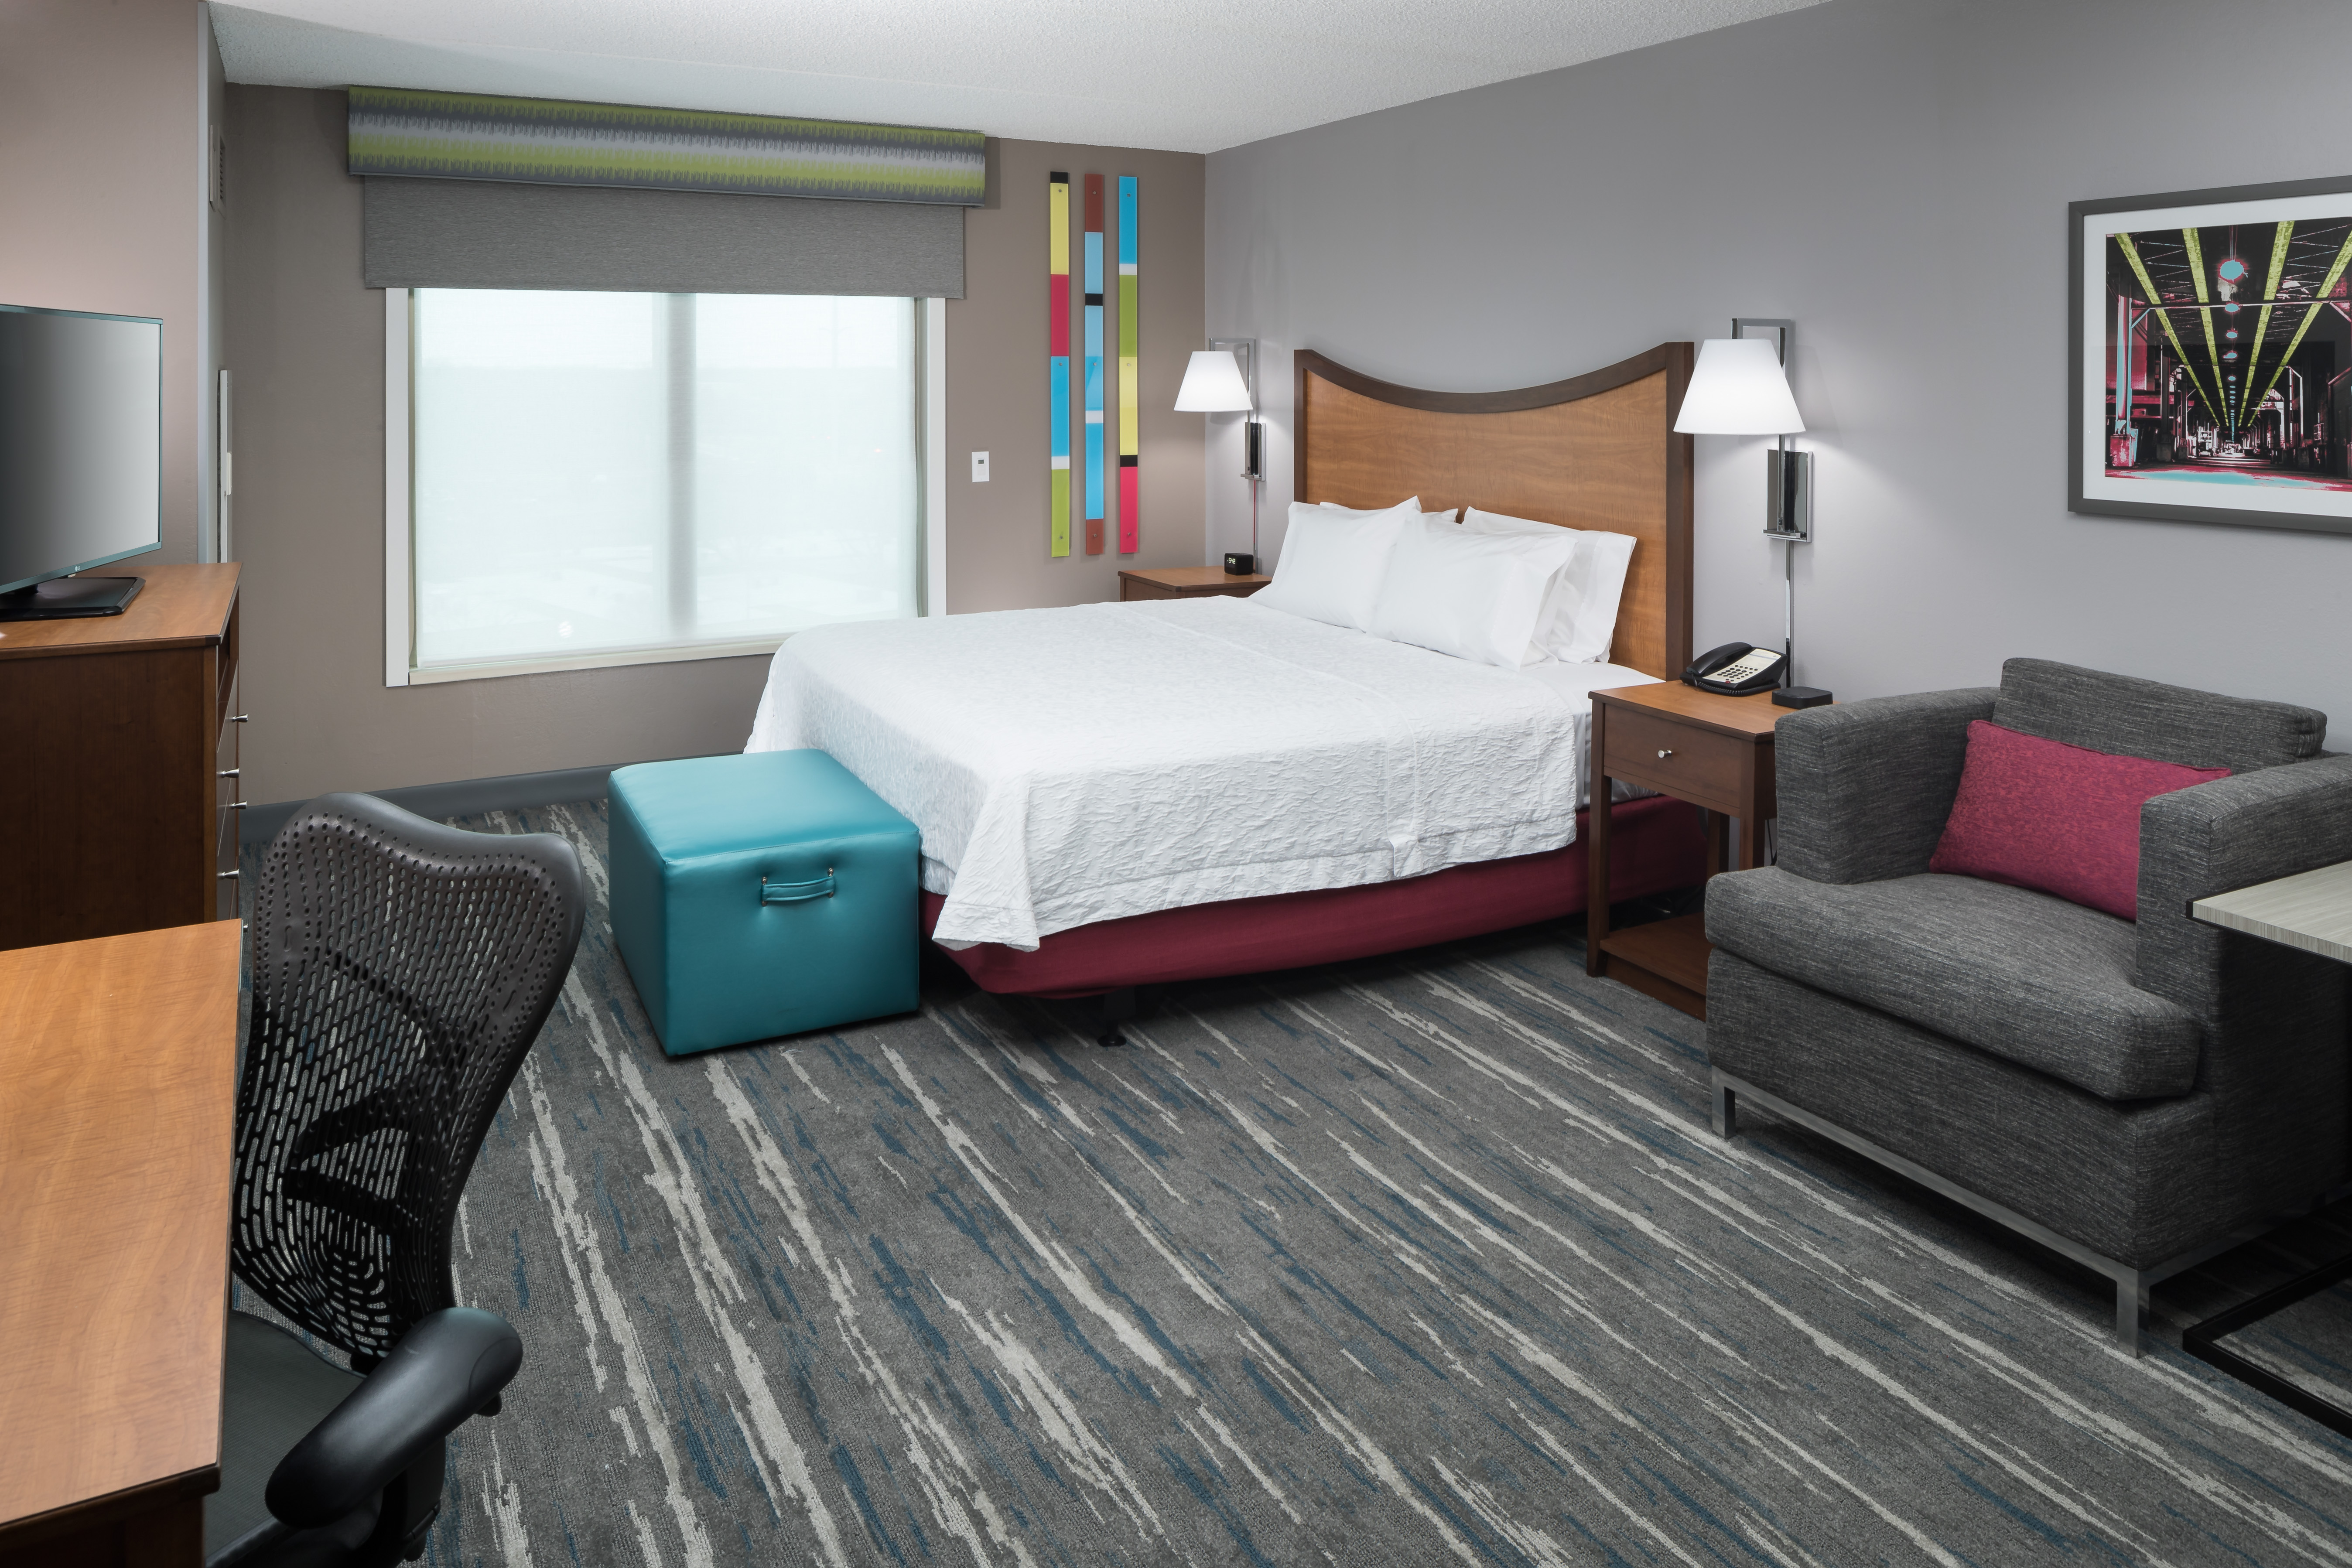 https://www.hotelsbyday.com/_data/default-hotel_image/4/23601/ahr-4274-chiskhx-444-nkjud.jpg